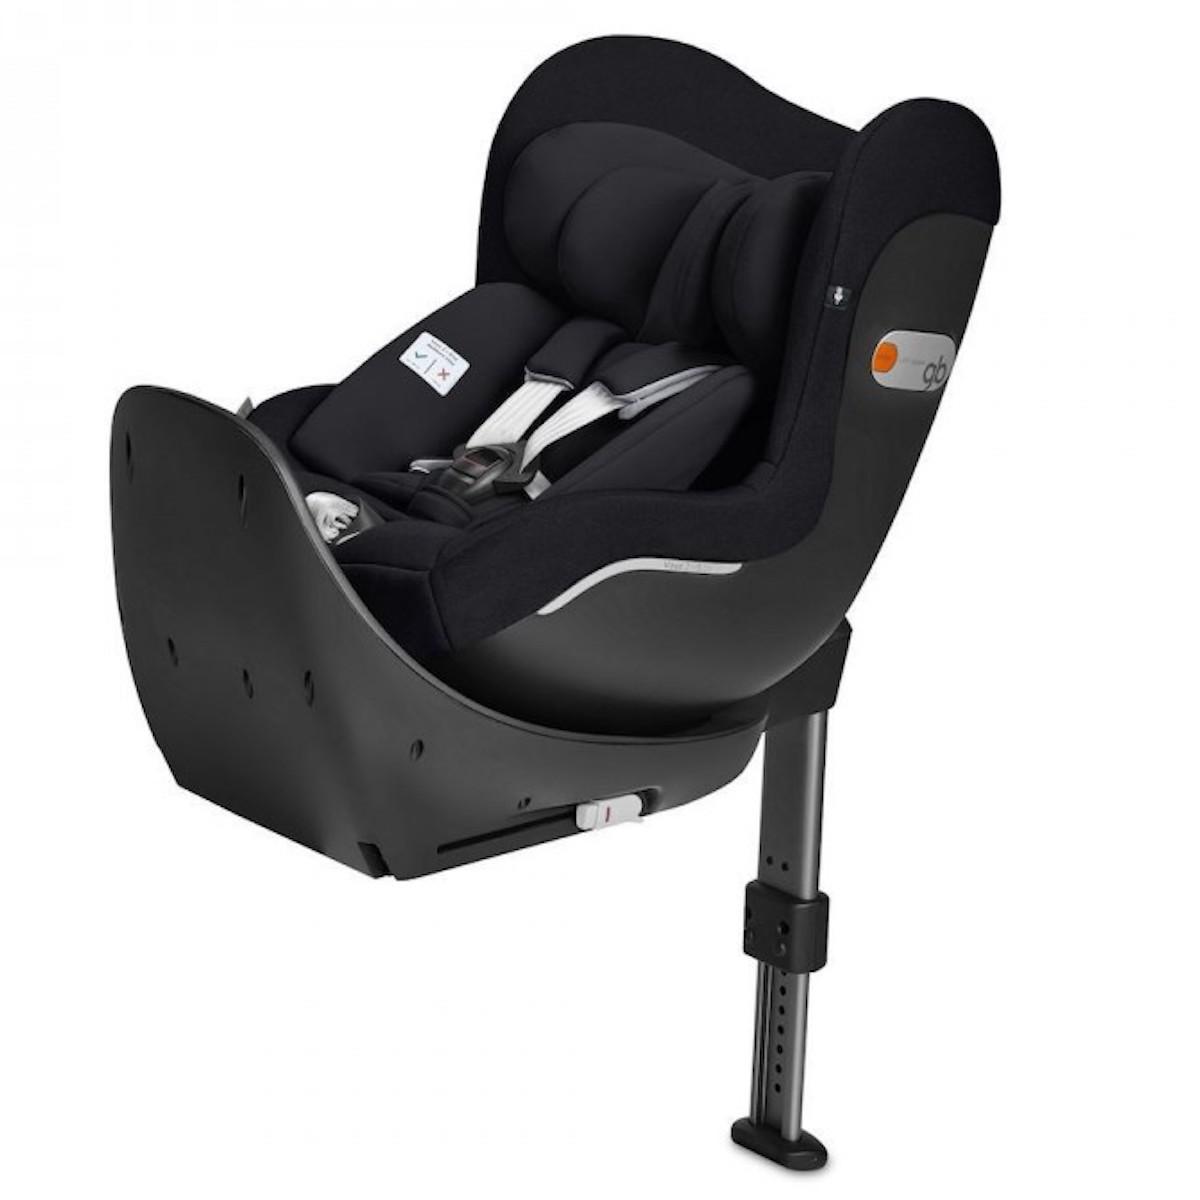 Silla auto gr 0+/1 VAYA 2 I-SIZE GB Satin black